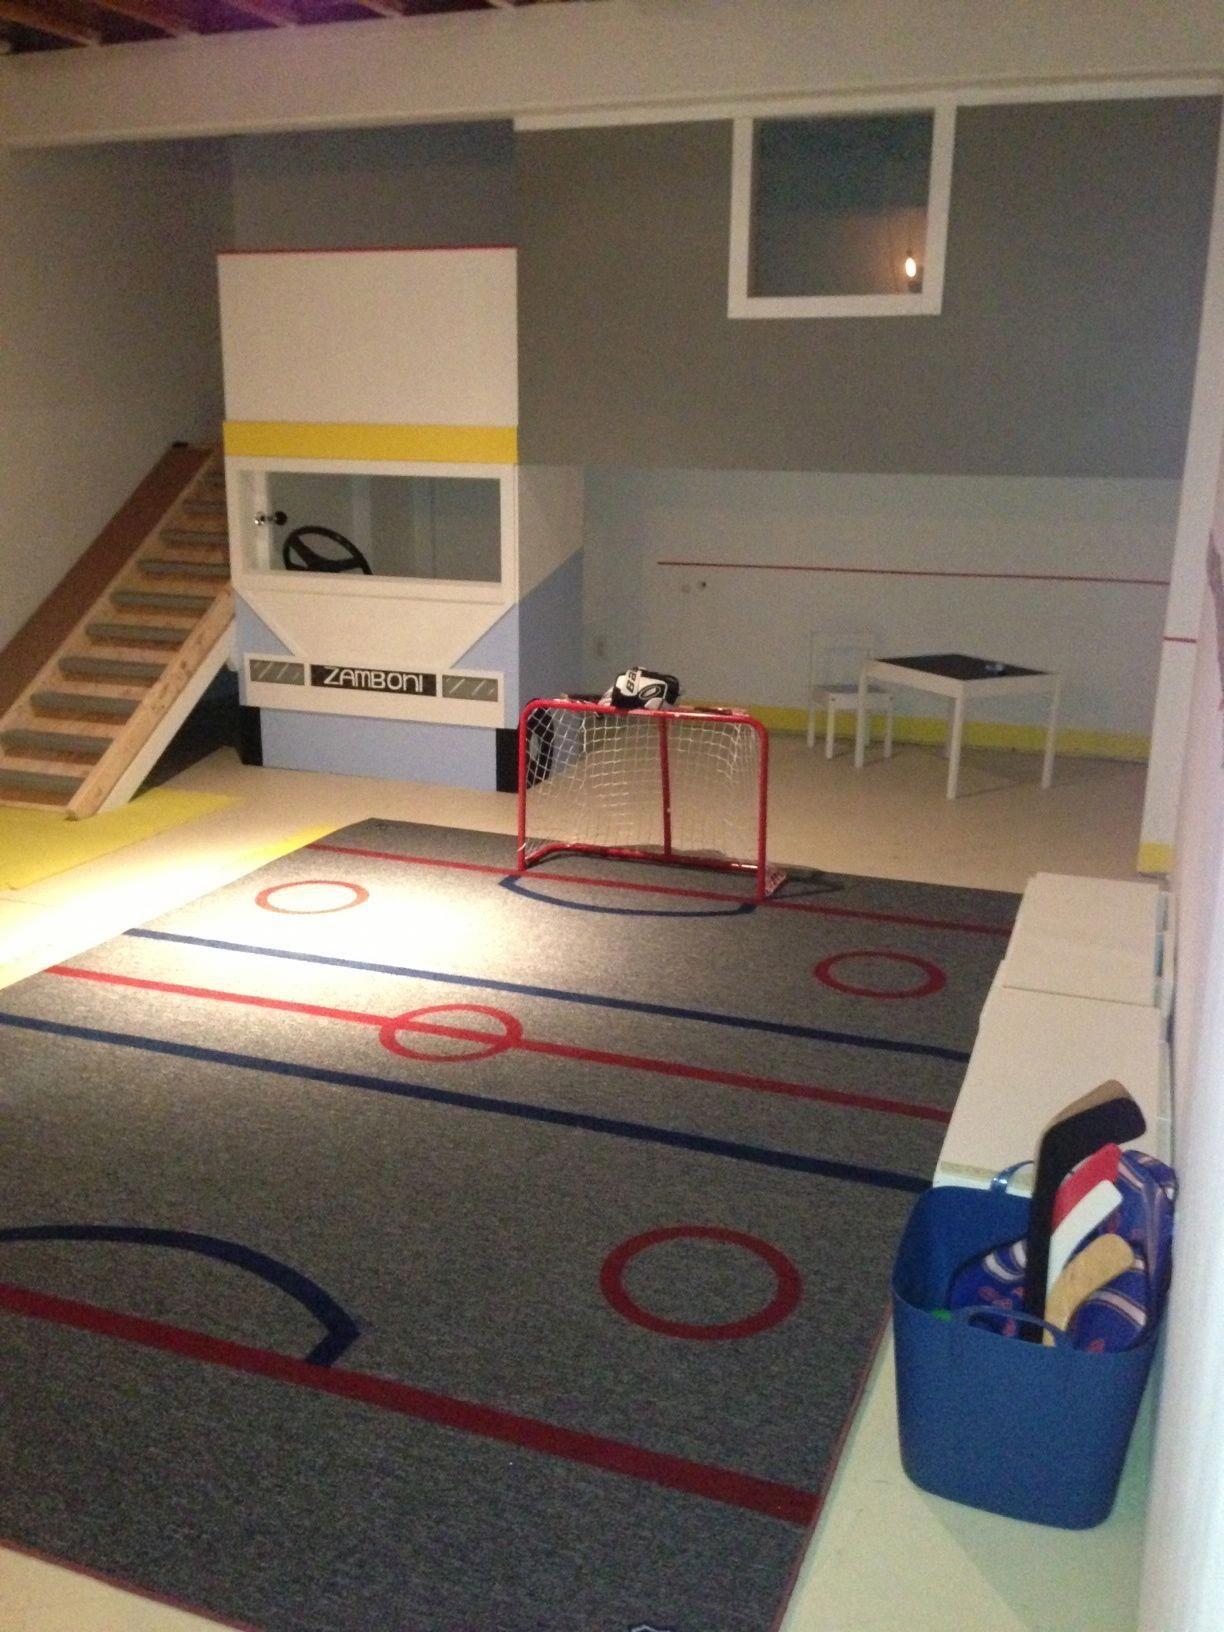 Pin By Christie Ilharramendy On Organize Hockey Bedroom Hockey Room Boys Hockey Room